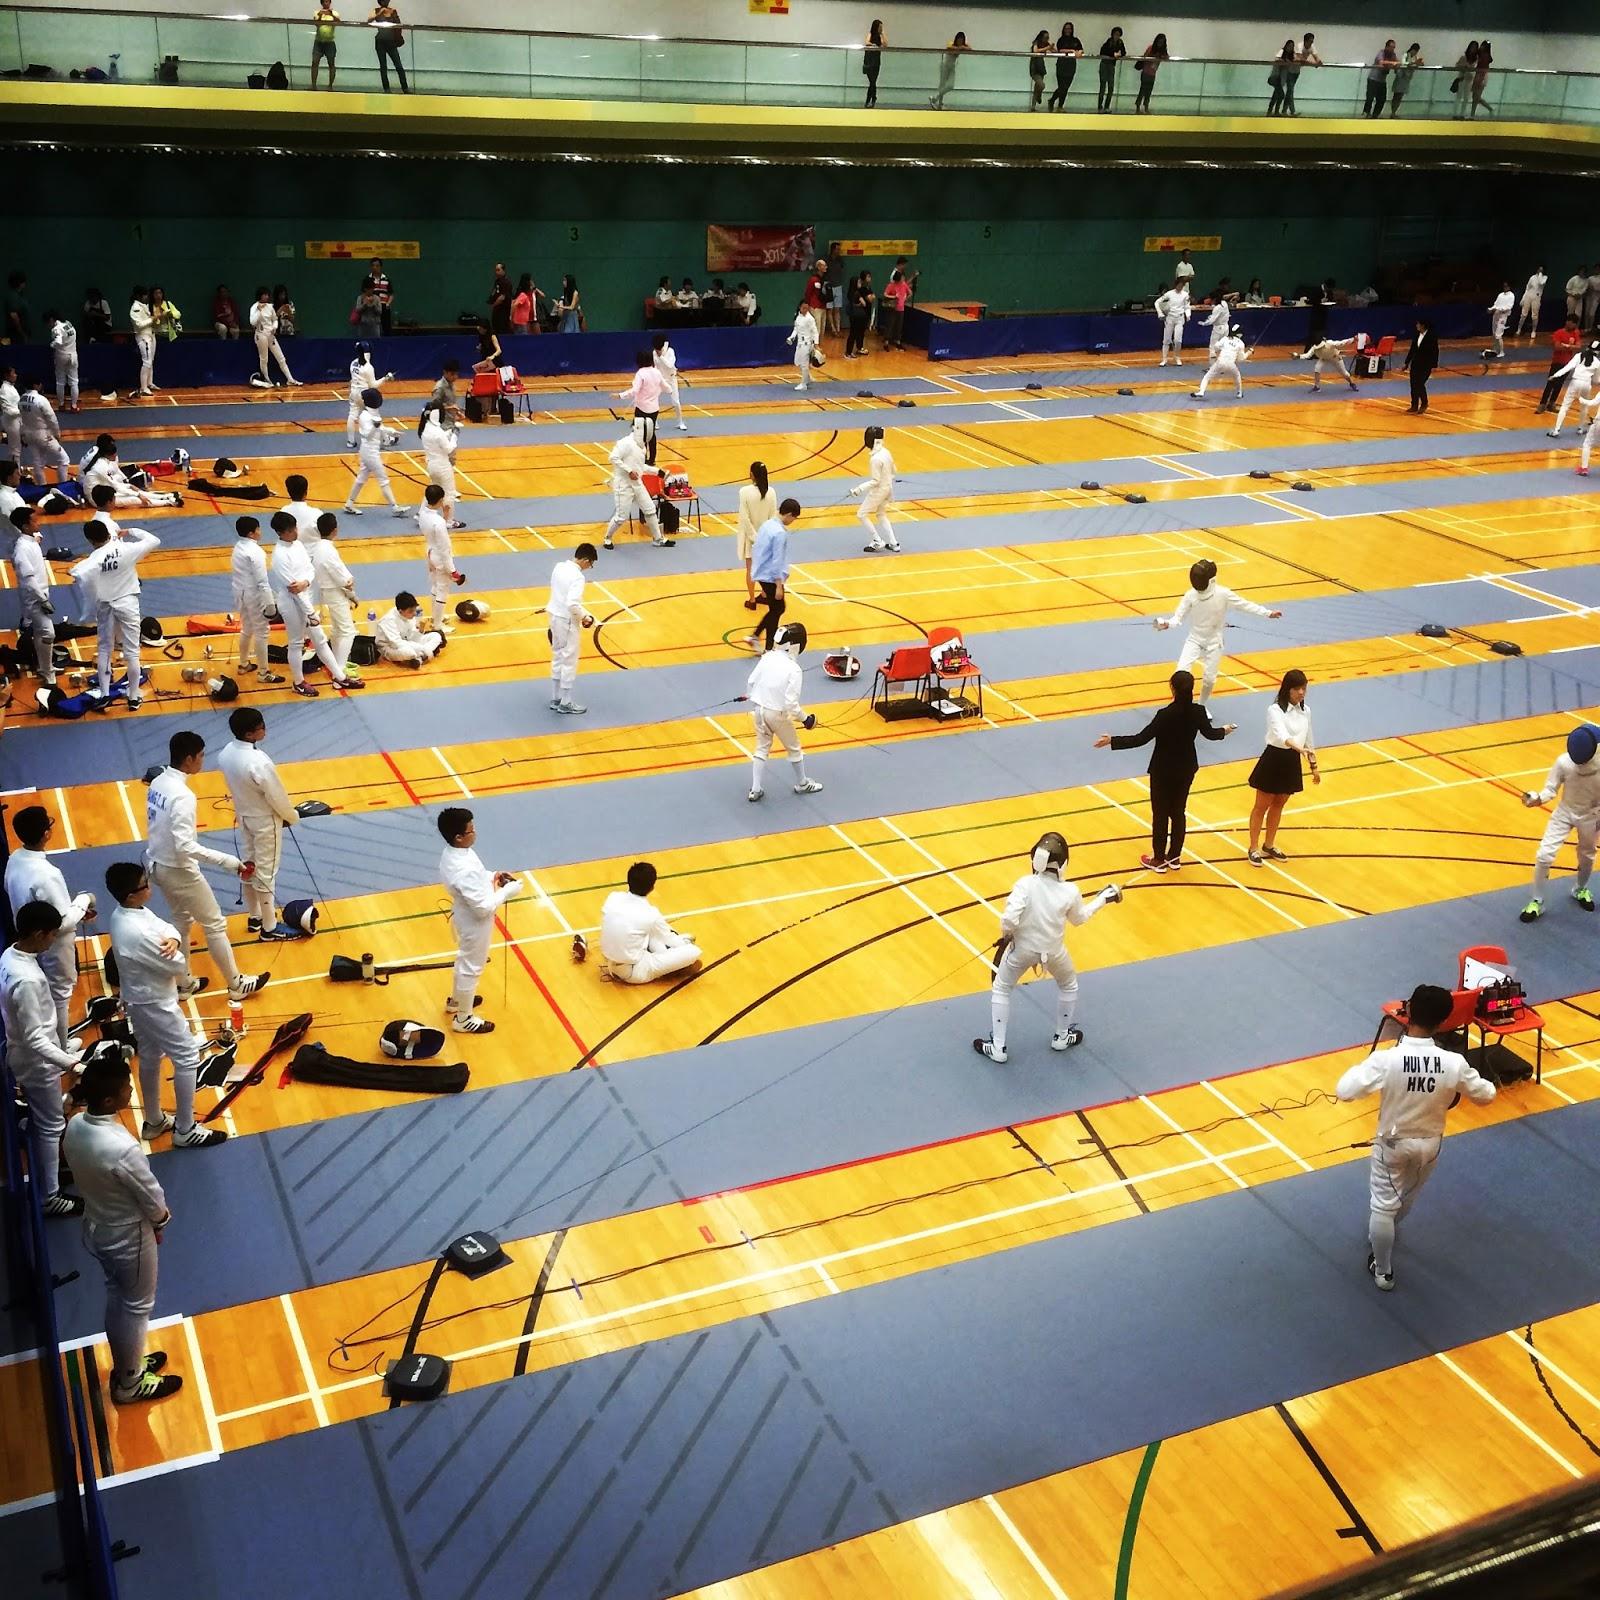 MOSMAN FENCING ACADEMY: 2015 Hong Kong Open U/14 Championships - SABRE